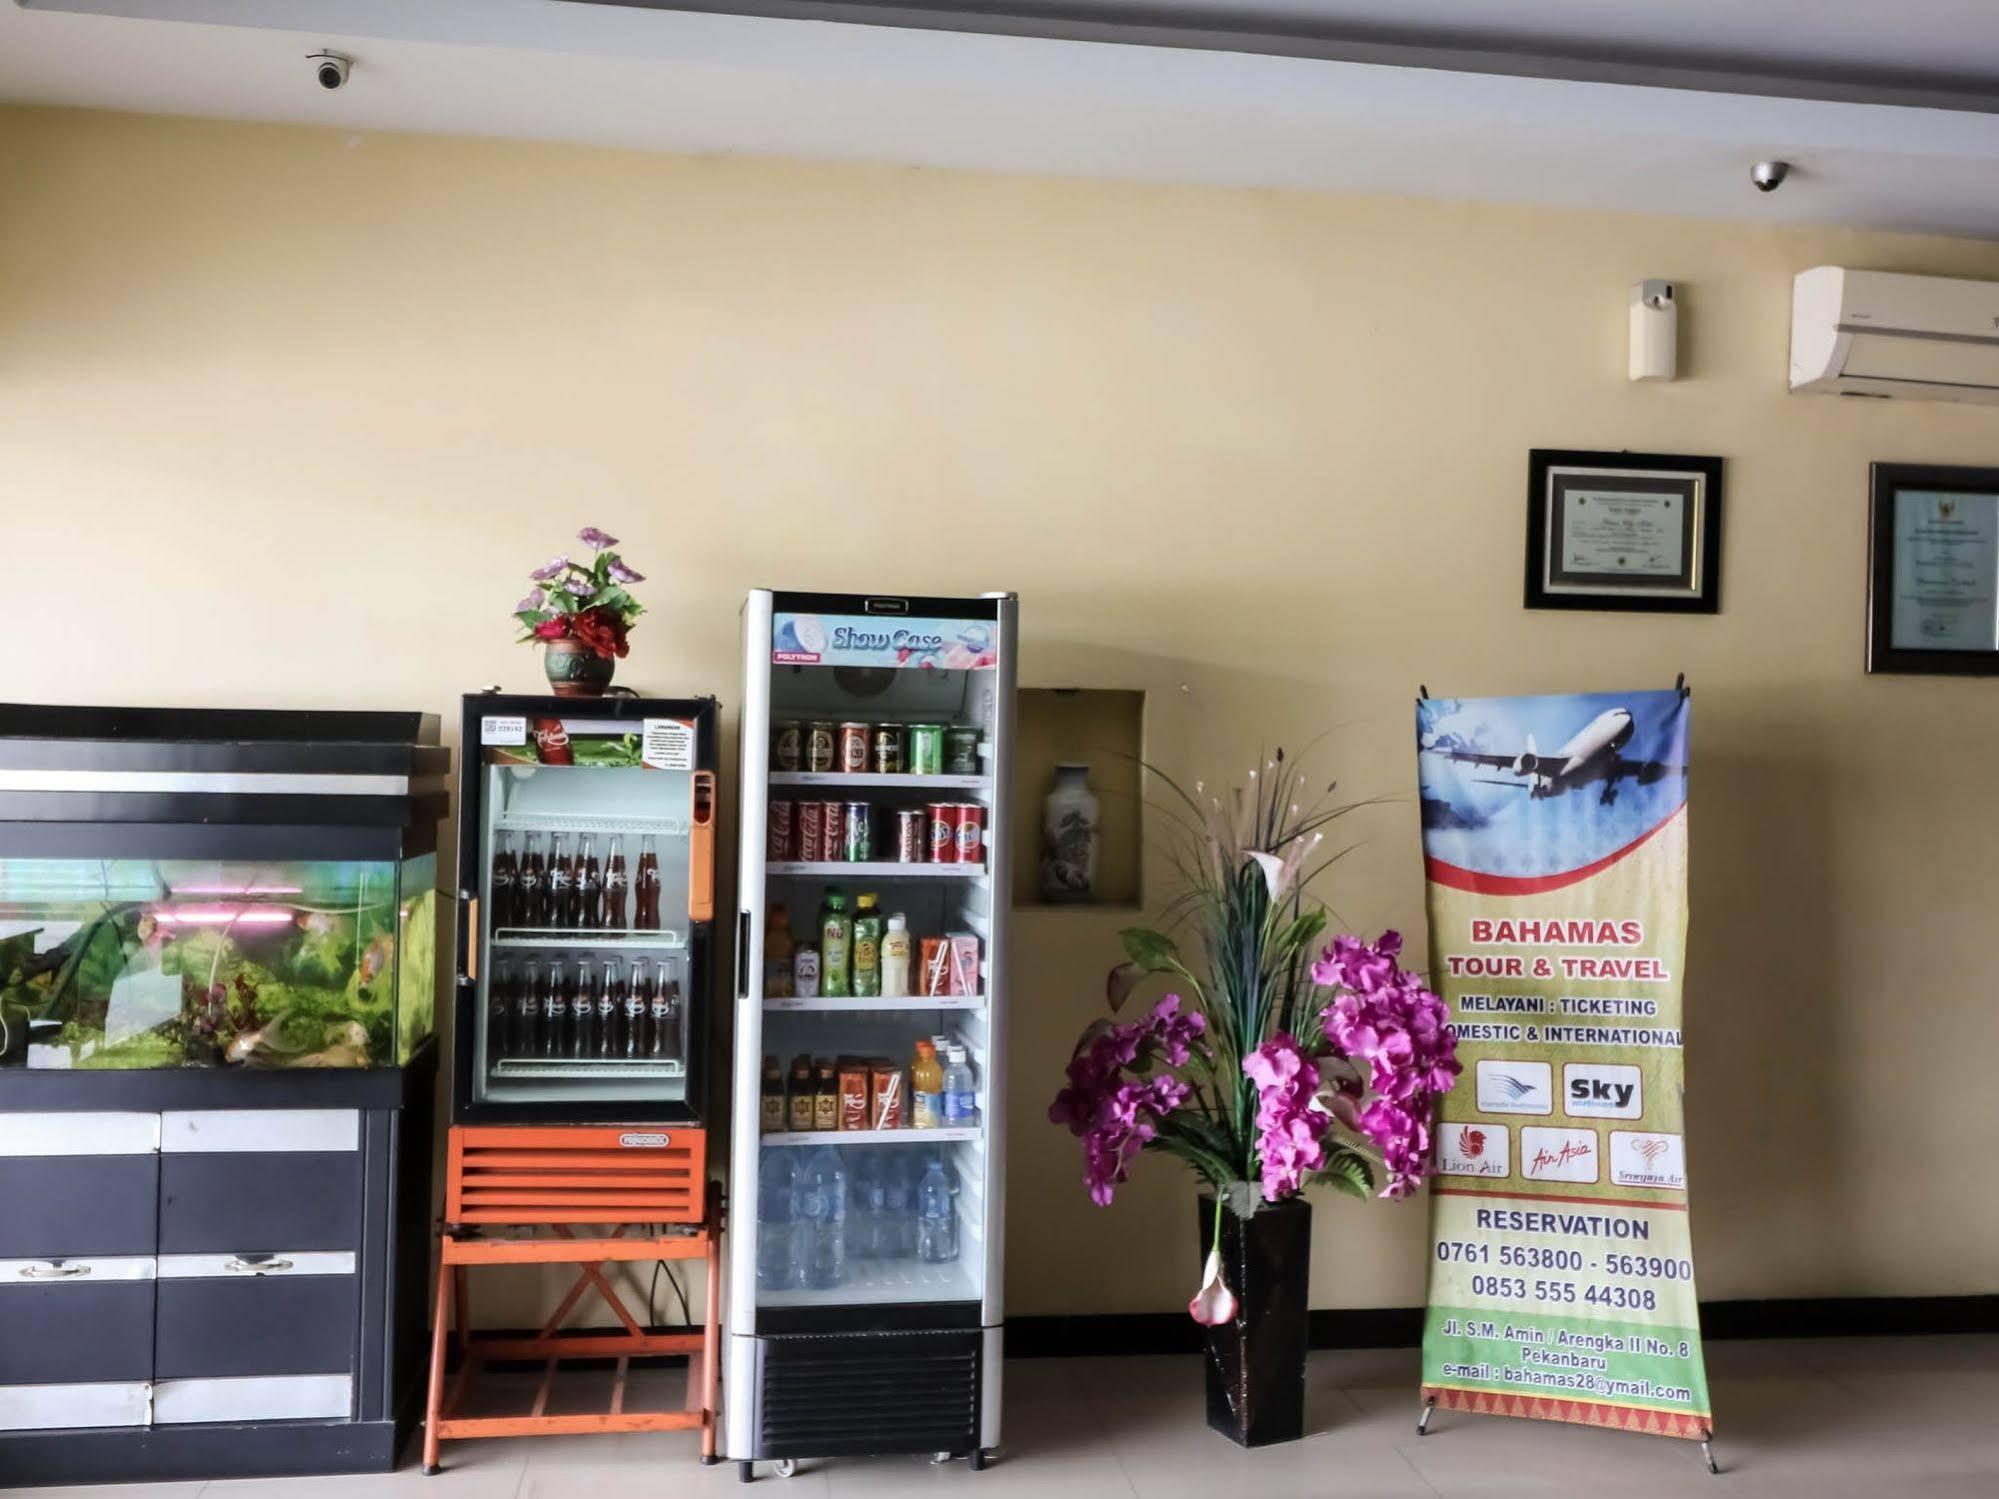 Nida Rooms Mall Ska Pekanbaru At Hotel Parma, Pekanbaru